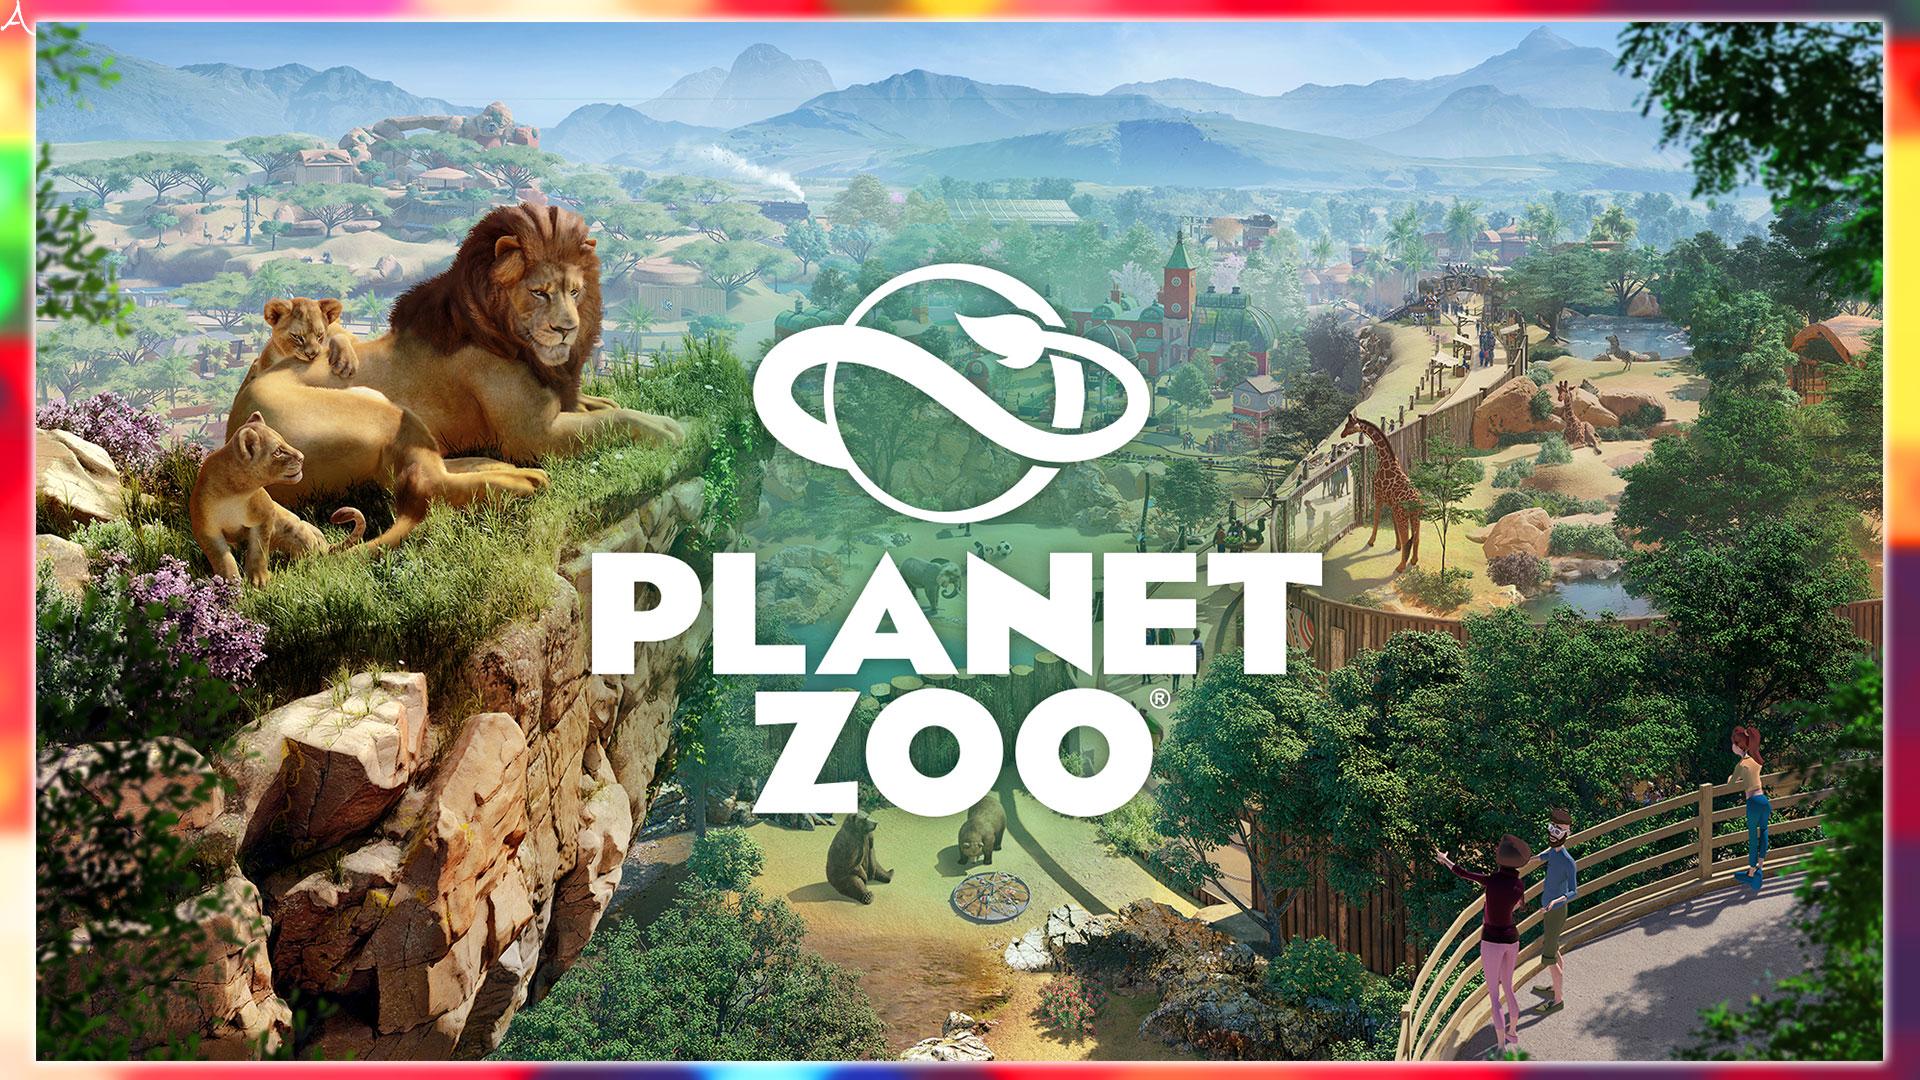 PC版「Planet Zoo」に必要な最低/推奨スペックを確認:快適プレイに必要な値段はどれくらい?